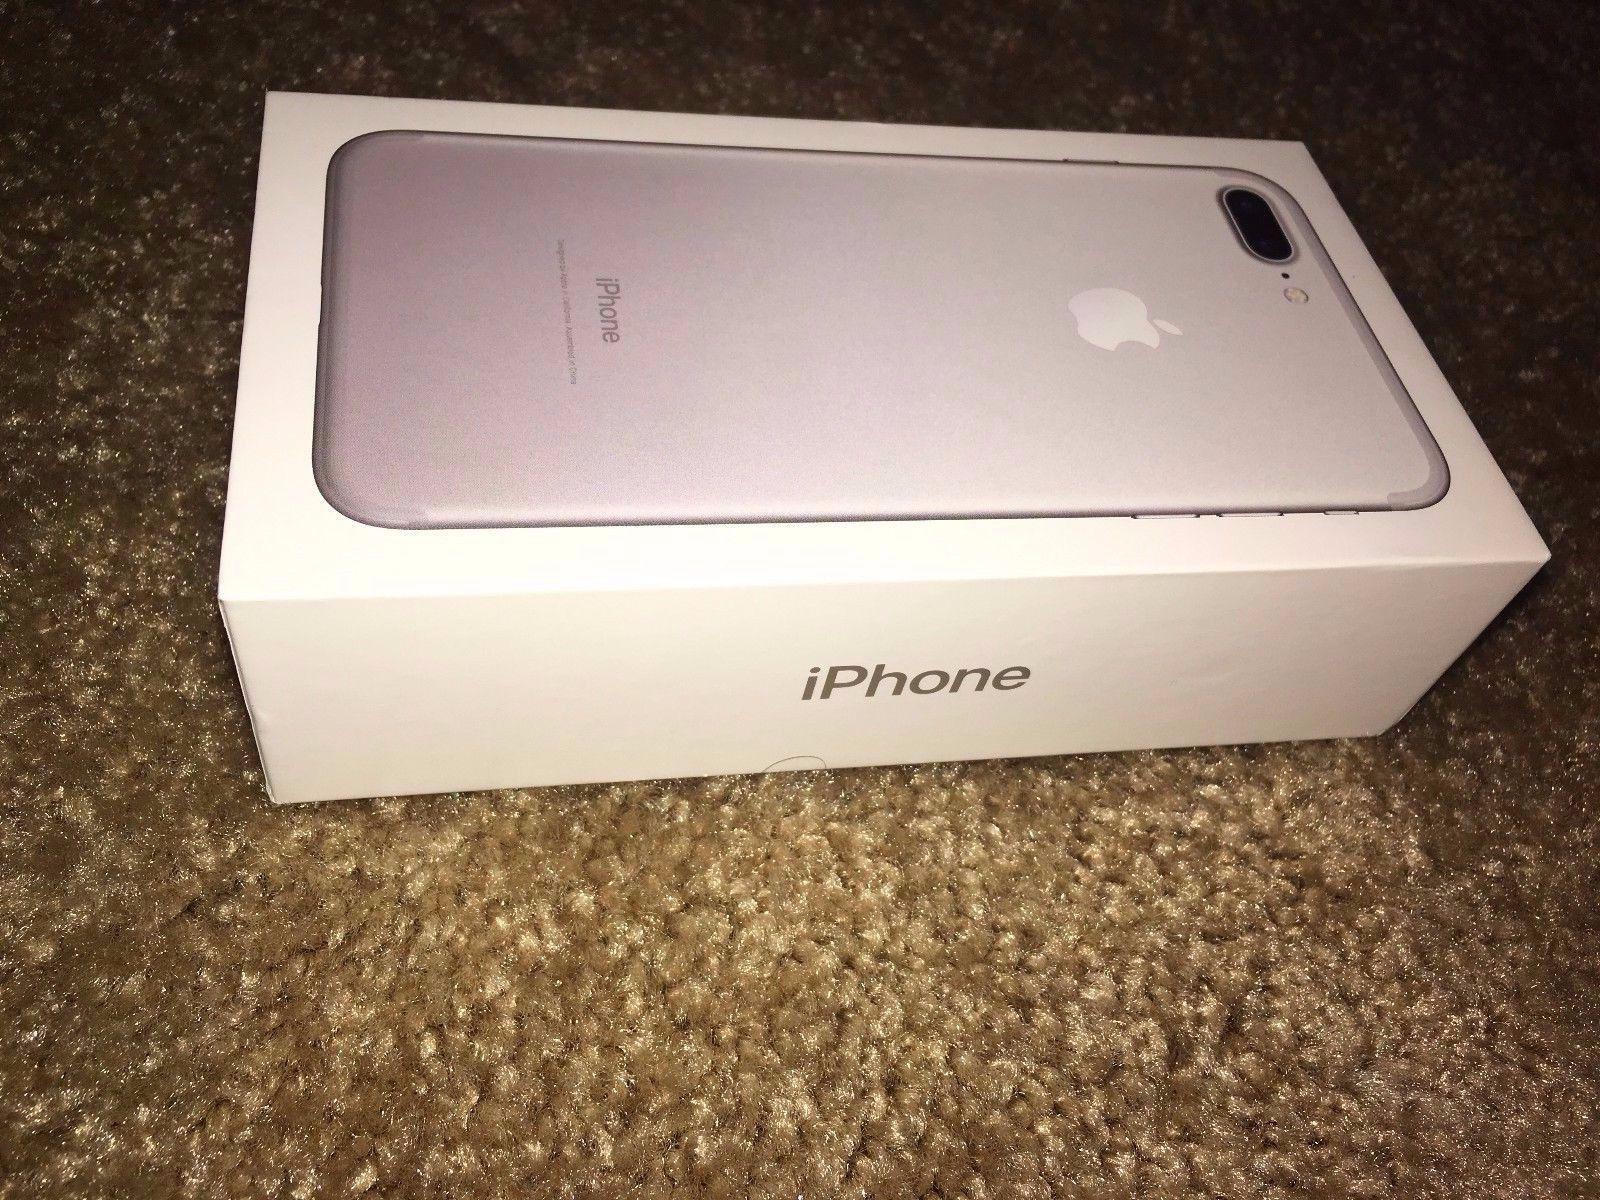 "Apple iPhone 7 Plus- 32GB -Sliver (Sprint) Smartphone financed "" New"" see detial https://t.co/nPjQMFILNE https://t.co/NpMMiRpXIT"